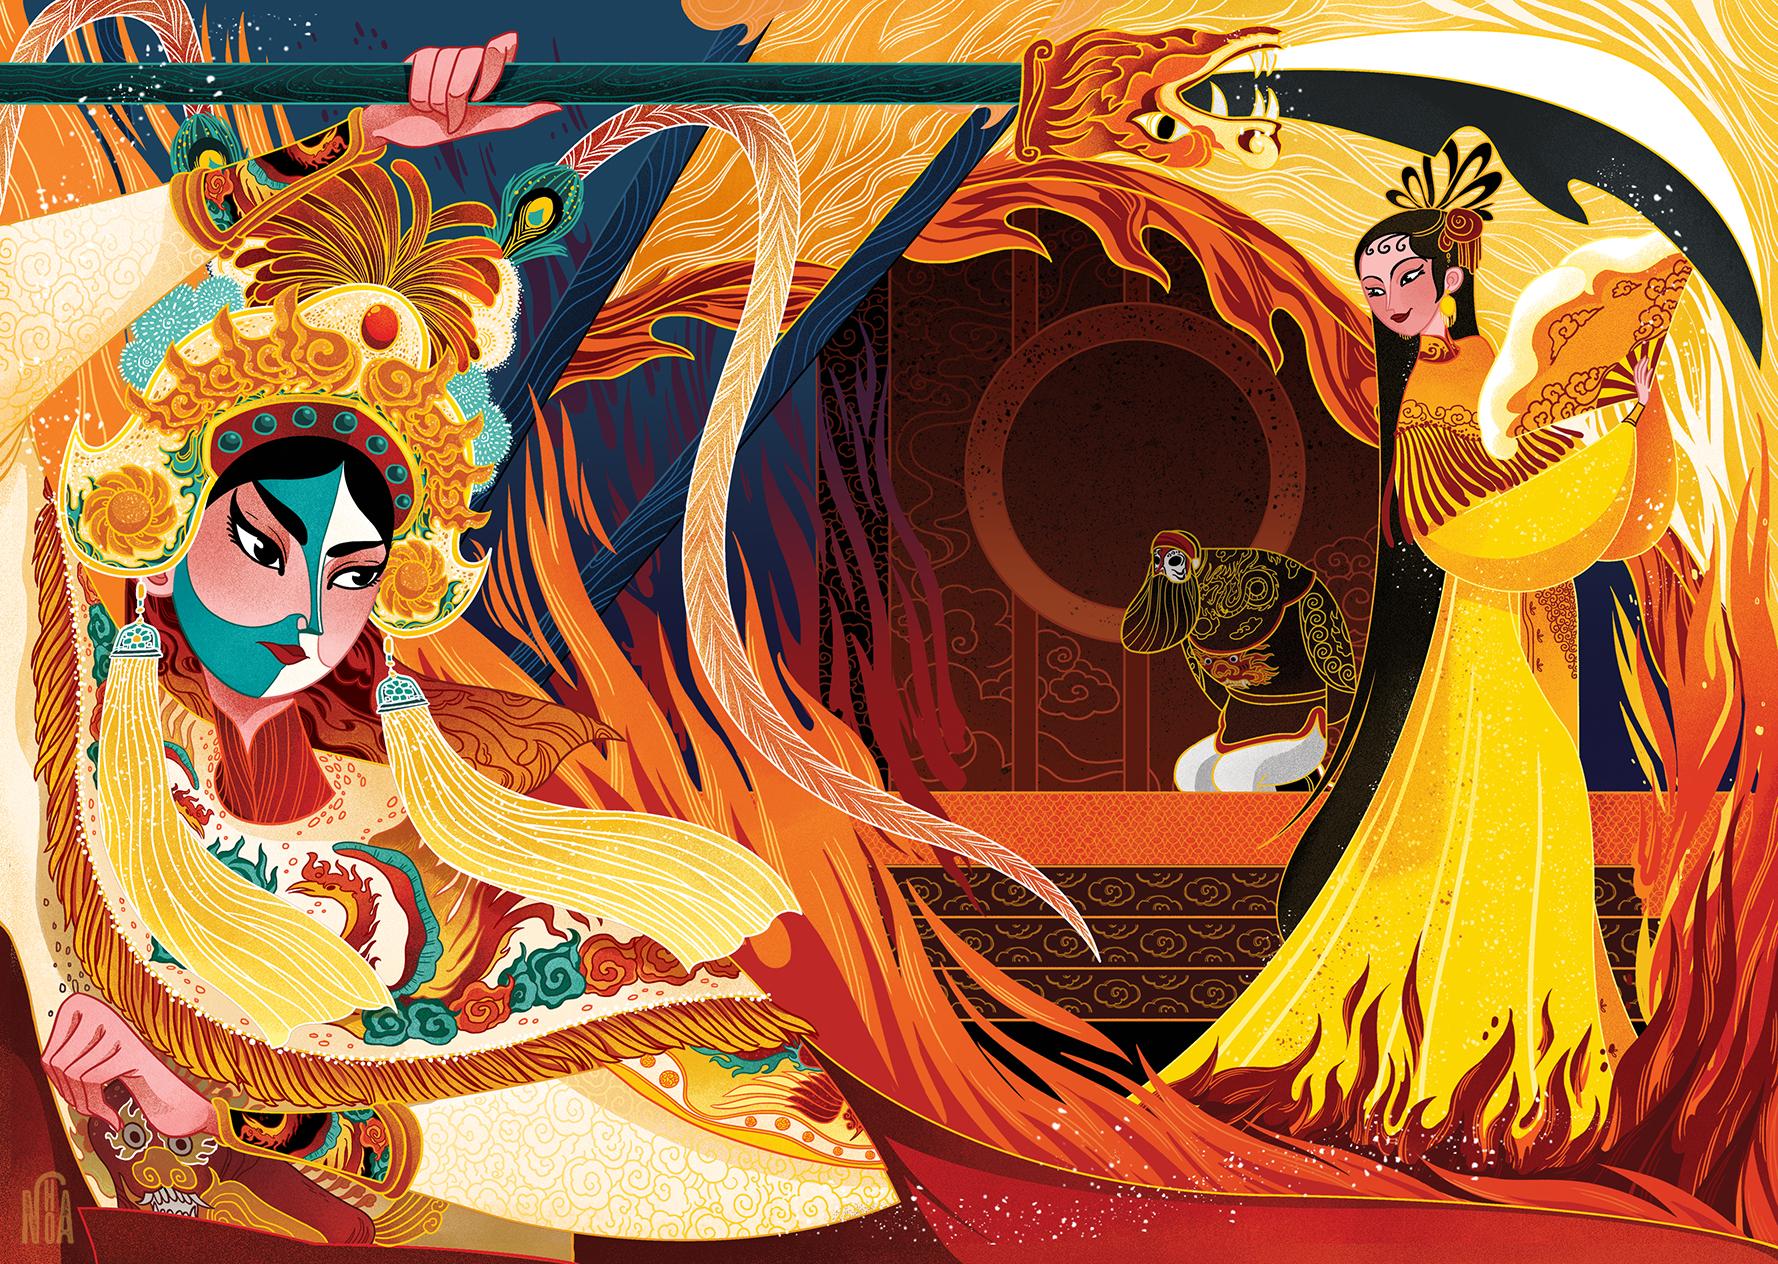 GirlsclubAsia-Artist-NohA-Vietnam-Illustration-Đào Tam Xuân